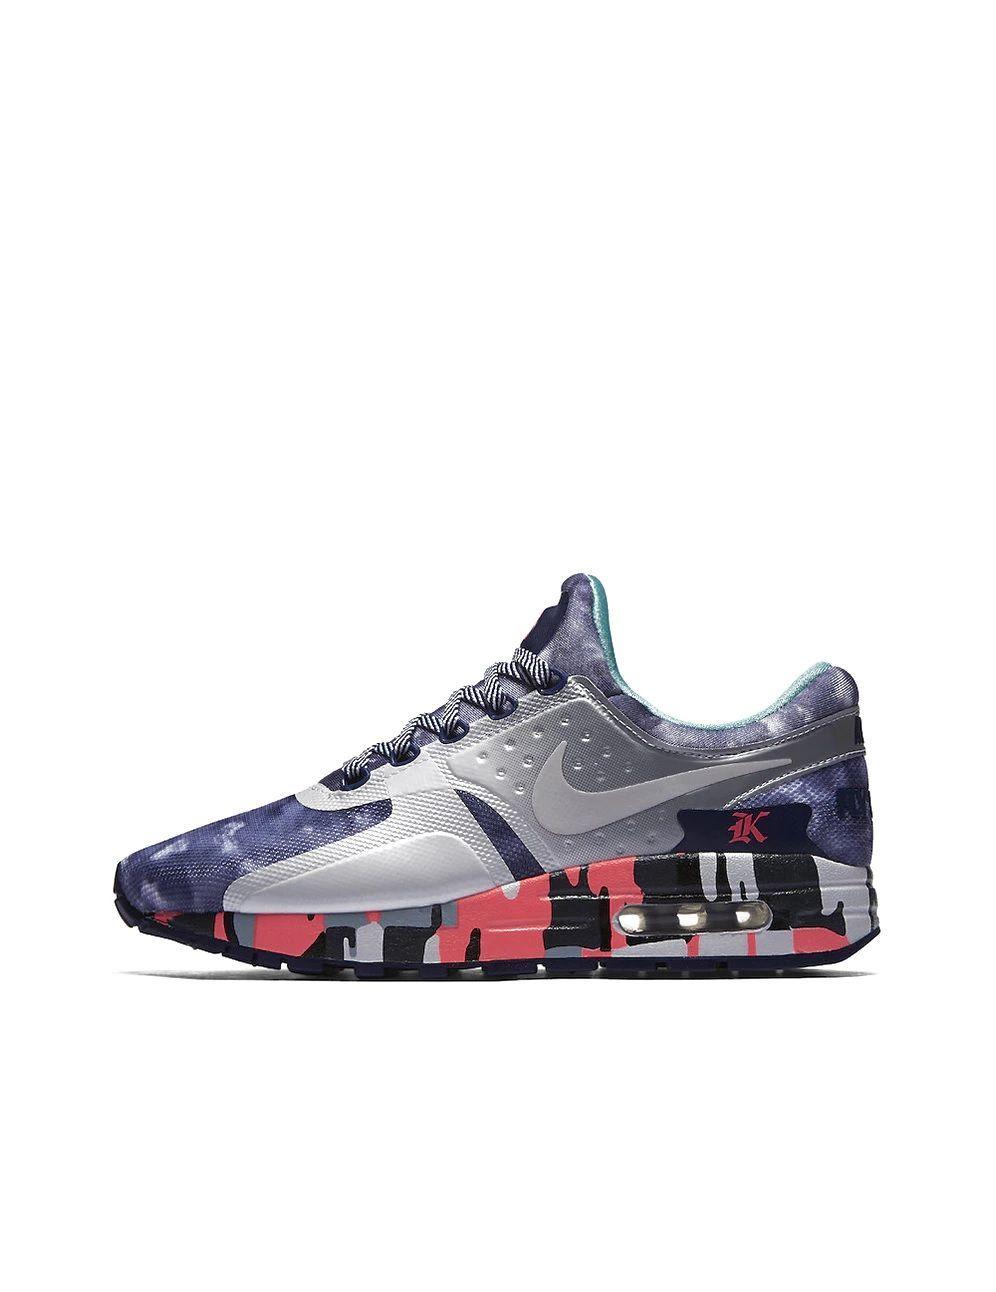 official photos bbcd0 cfed1 Wang Junkai x Nike Air Max Zero | Nike Air Max | Nike air ...